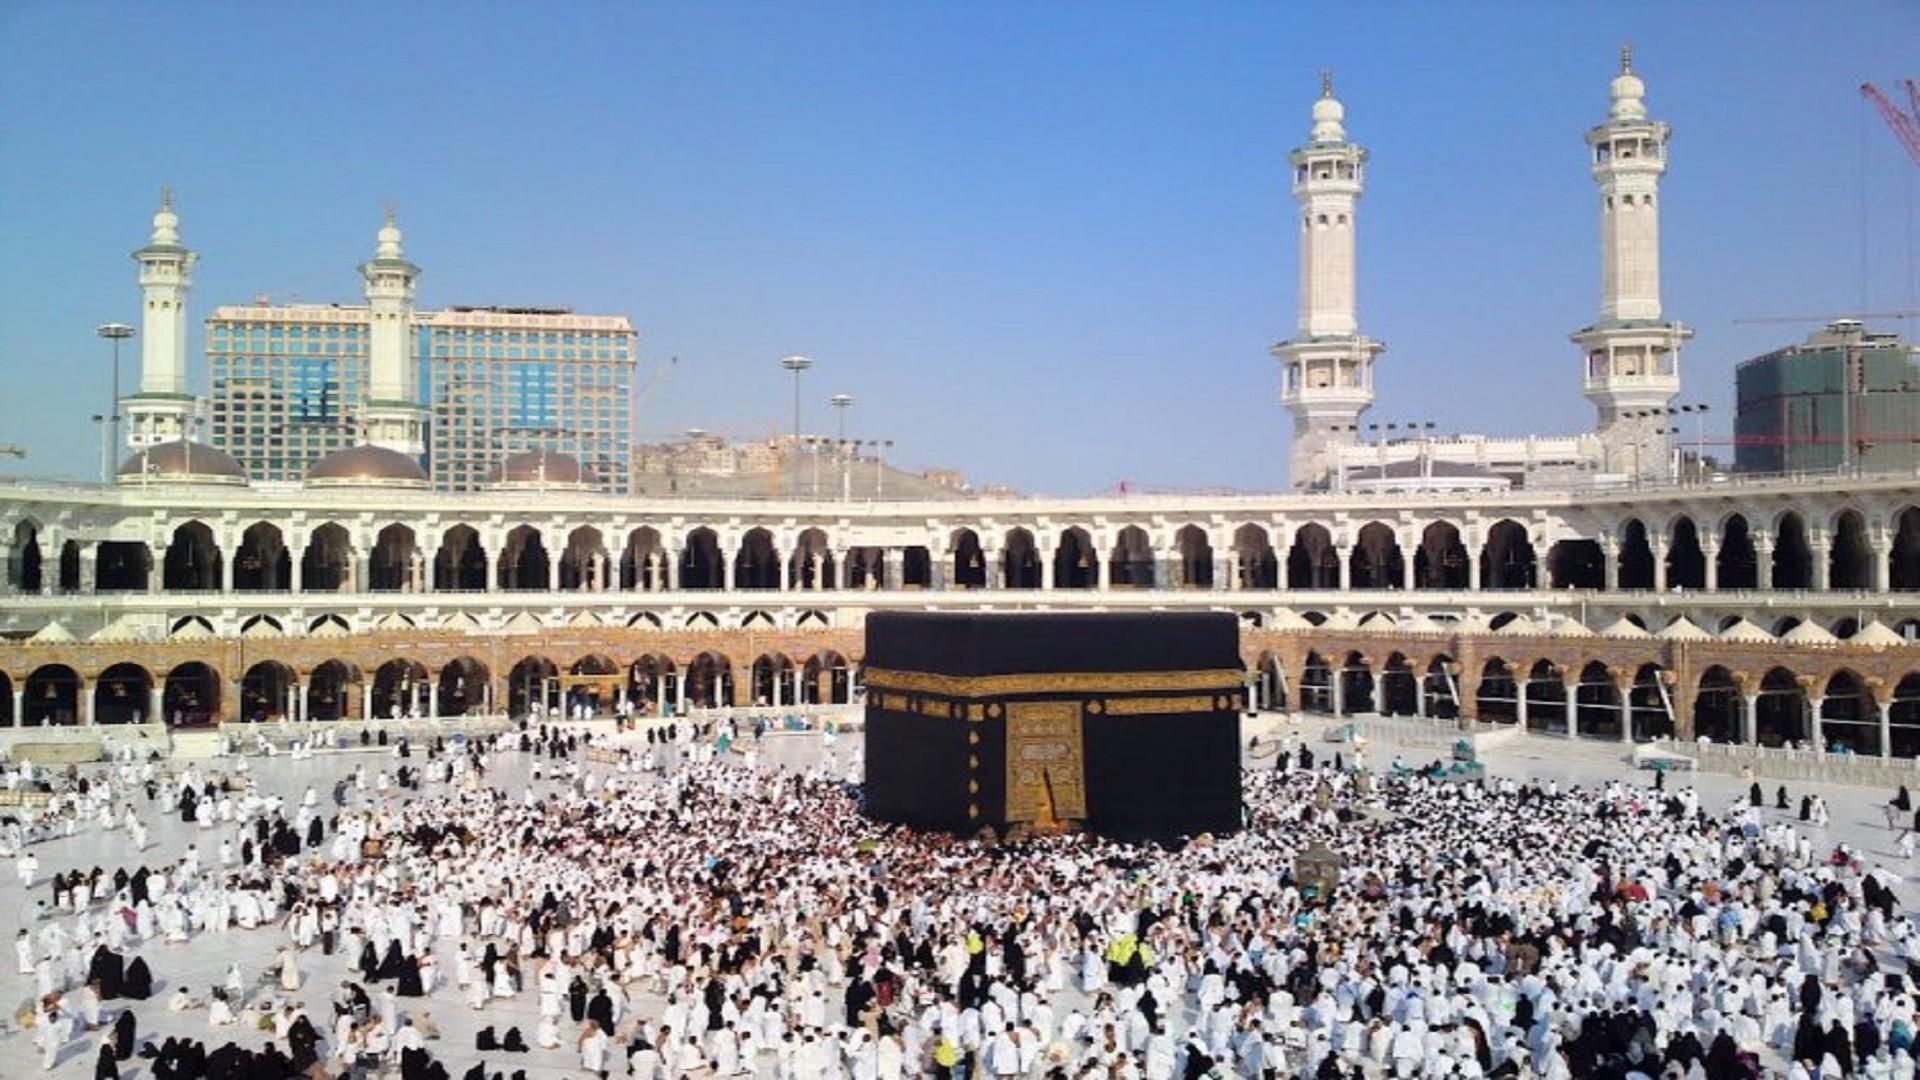 Res: 1920x1080, Hd-free-wallpaper-top-makkah-beautiful